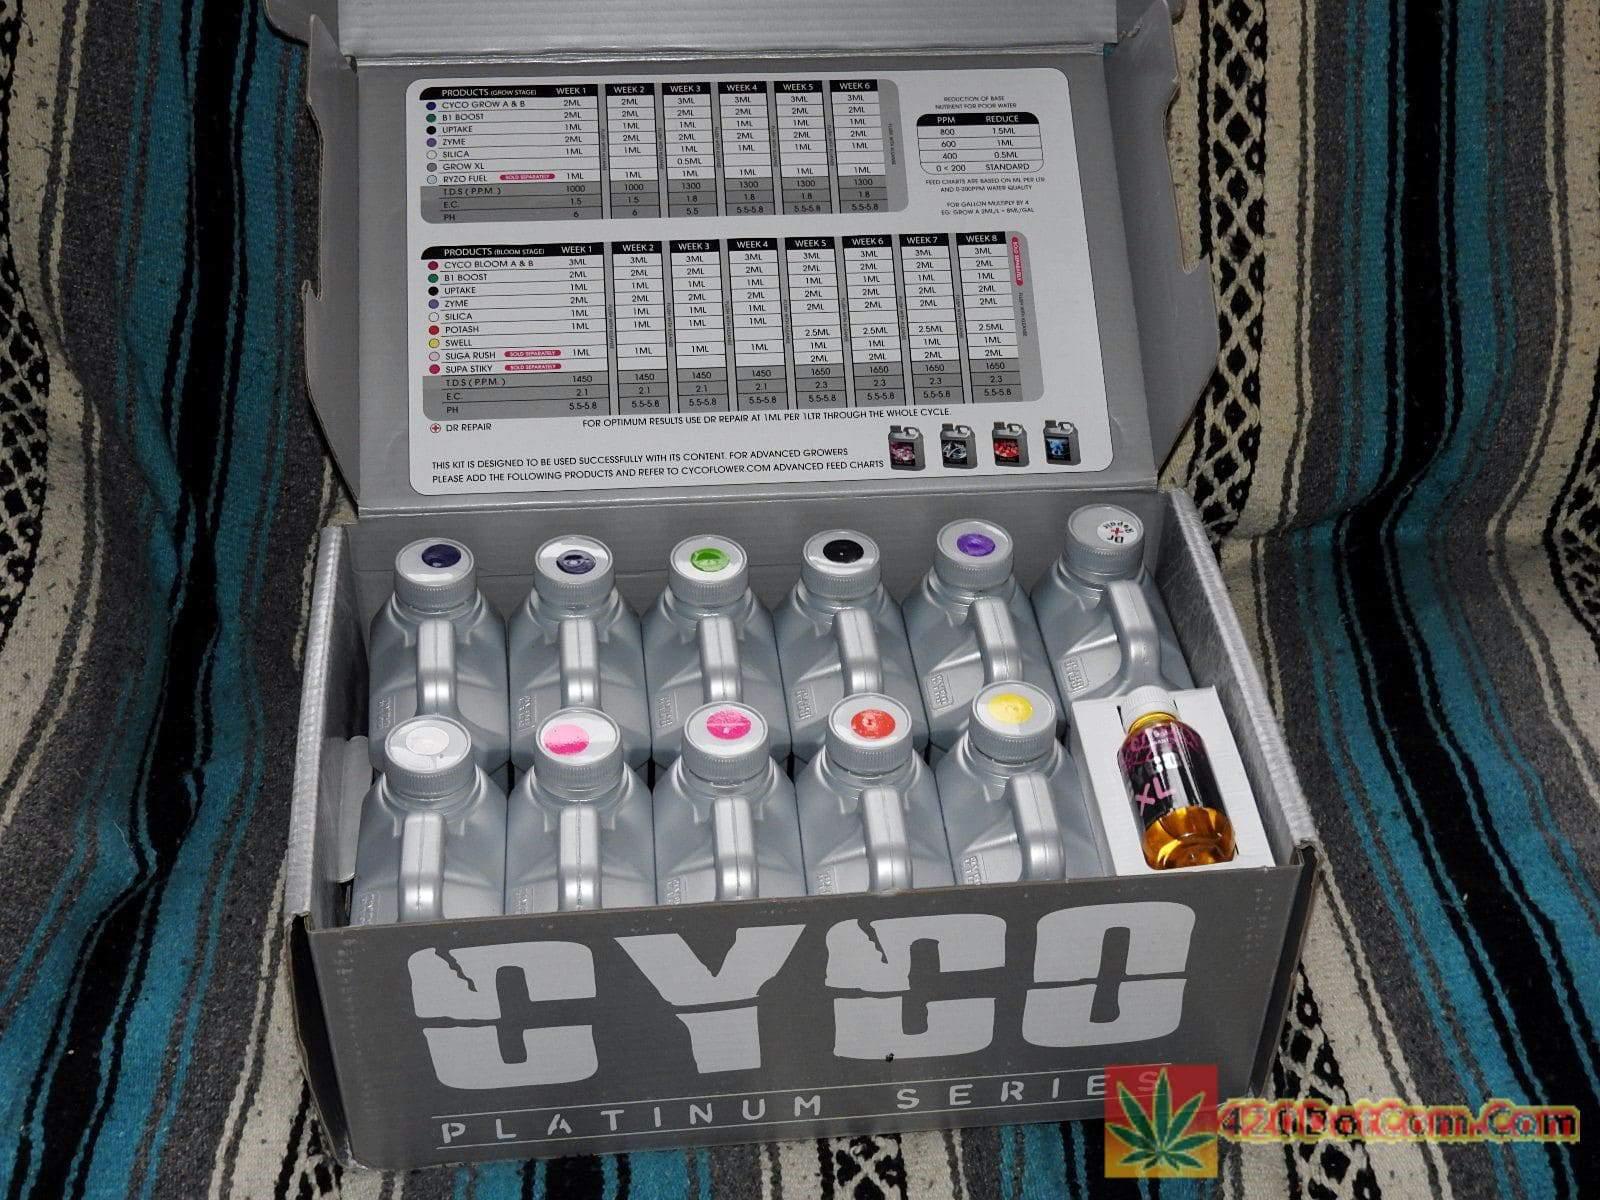 Cyco Platinum Pro Starter Kit